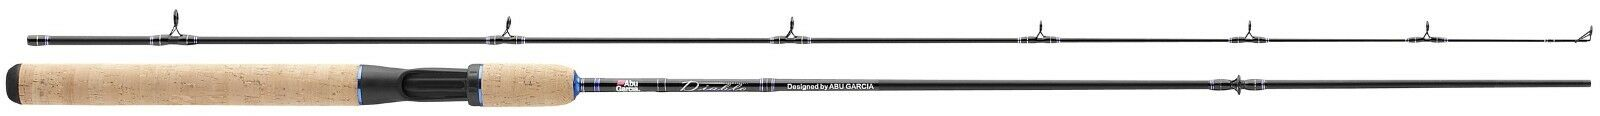 ABU GARCIA DEVIL SPIN Rod * Tutti i i i modelli * NUOVA esca da Pesca Spinning Rod 2ba84b